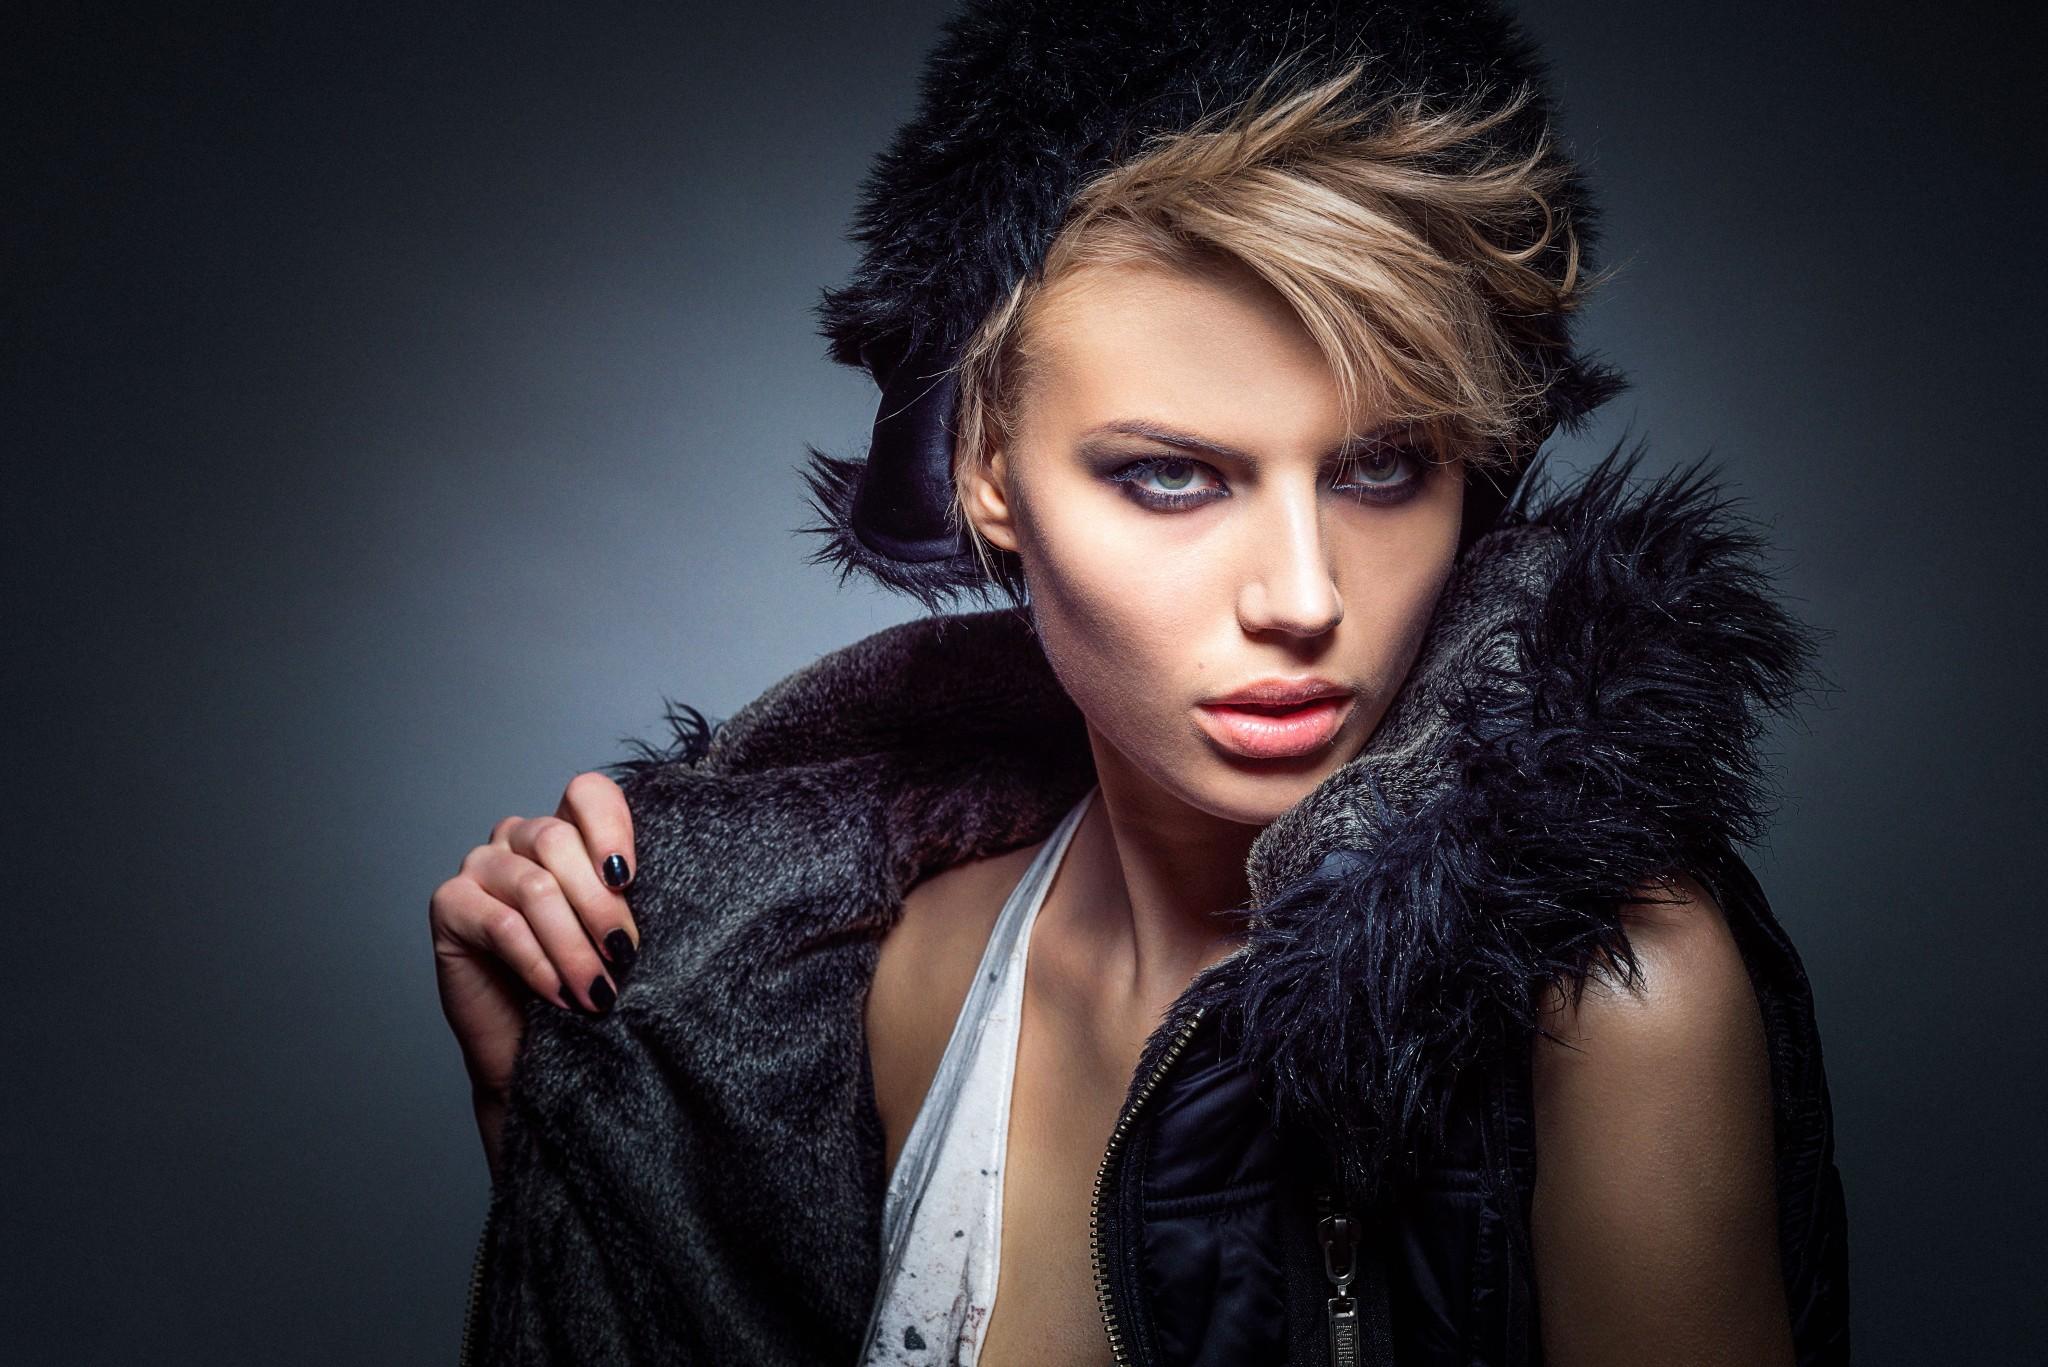 High key fashion photography 55